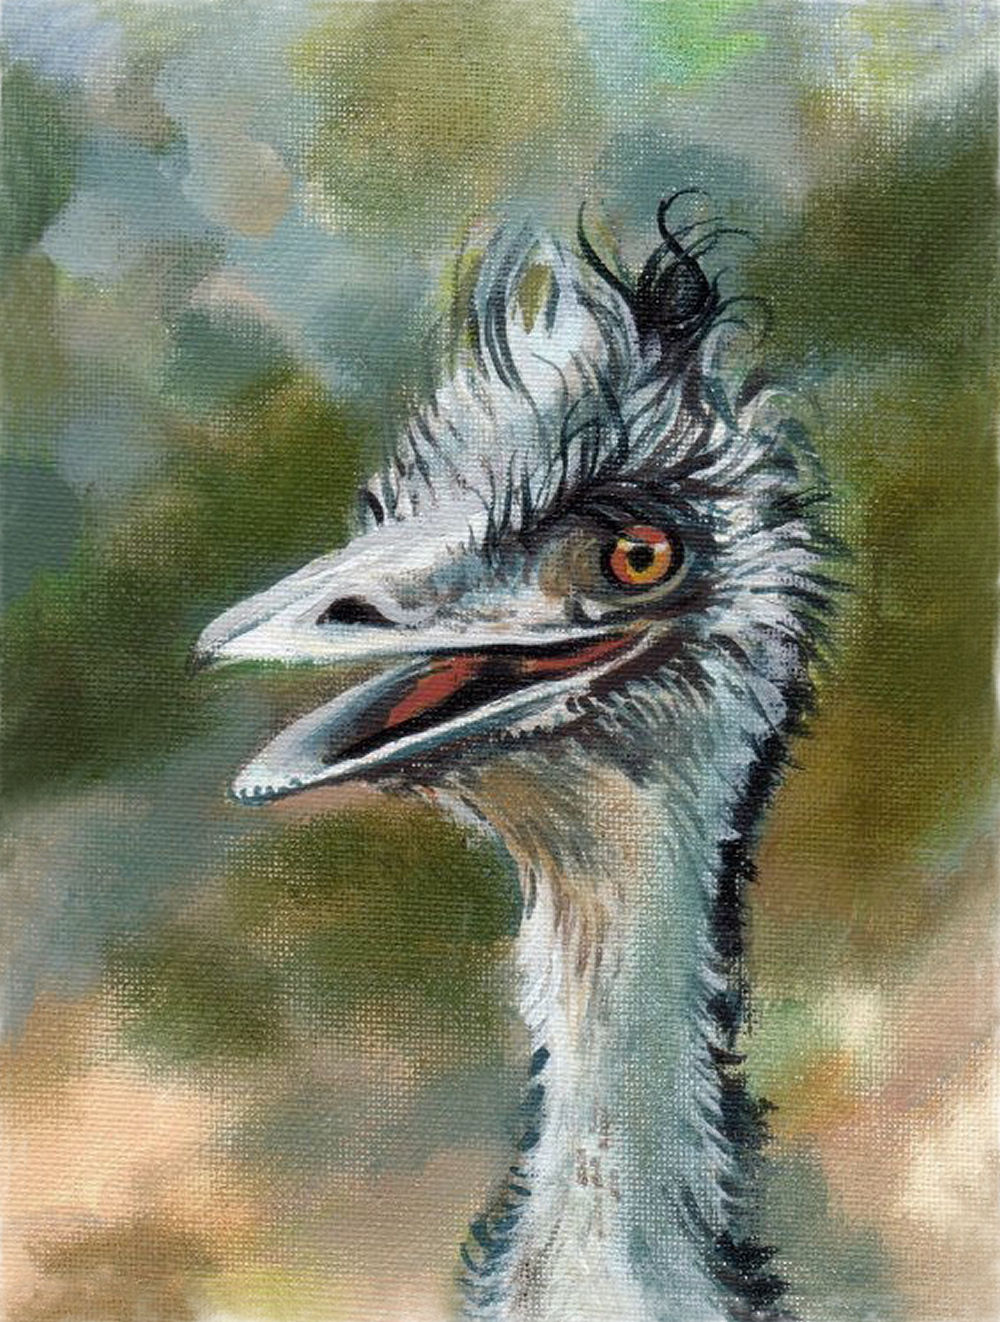 Emu, Kangaroo Island, Australia 6H x 4W inches acrylics on canvas board